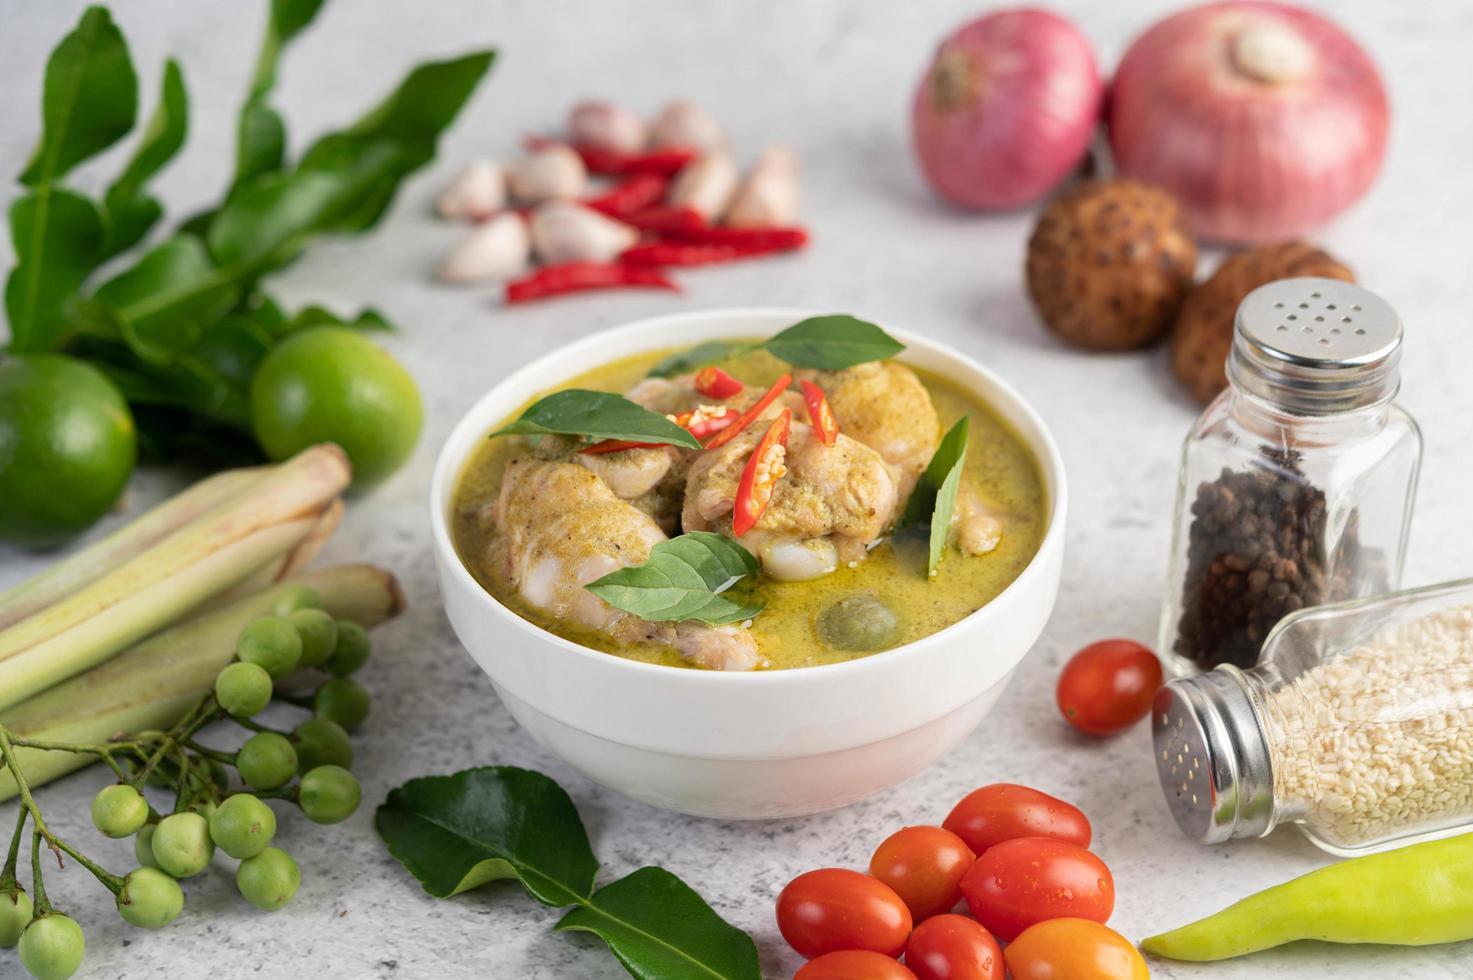 Green curry chicken photo